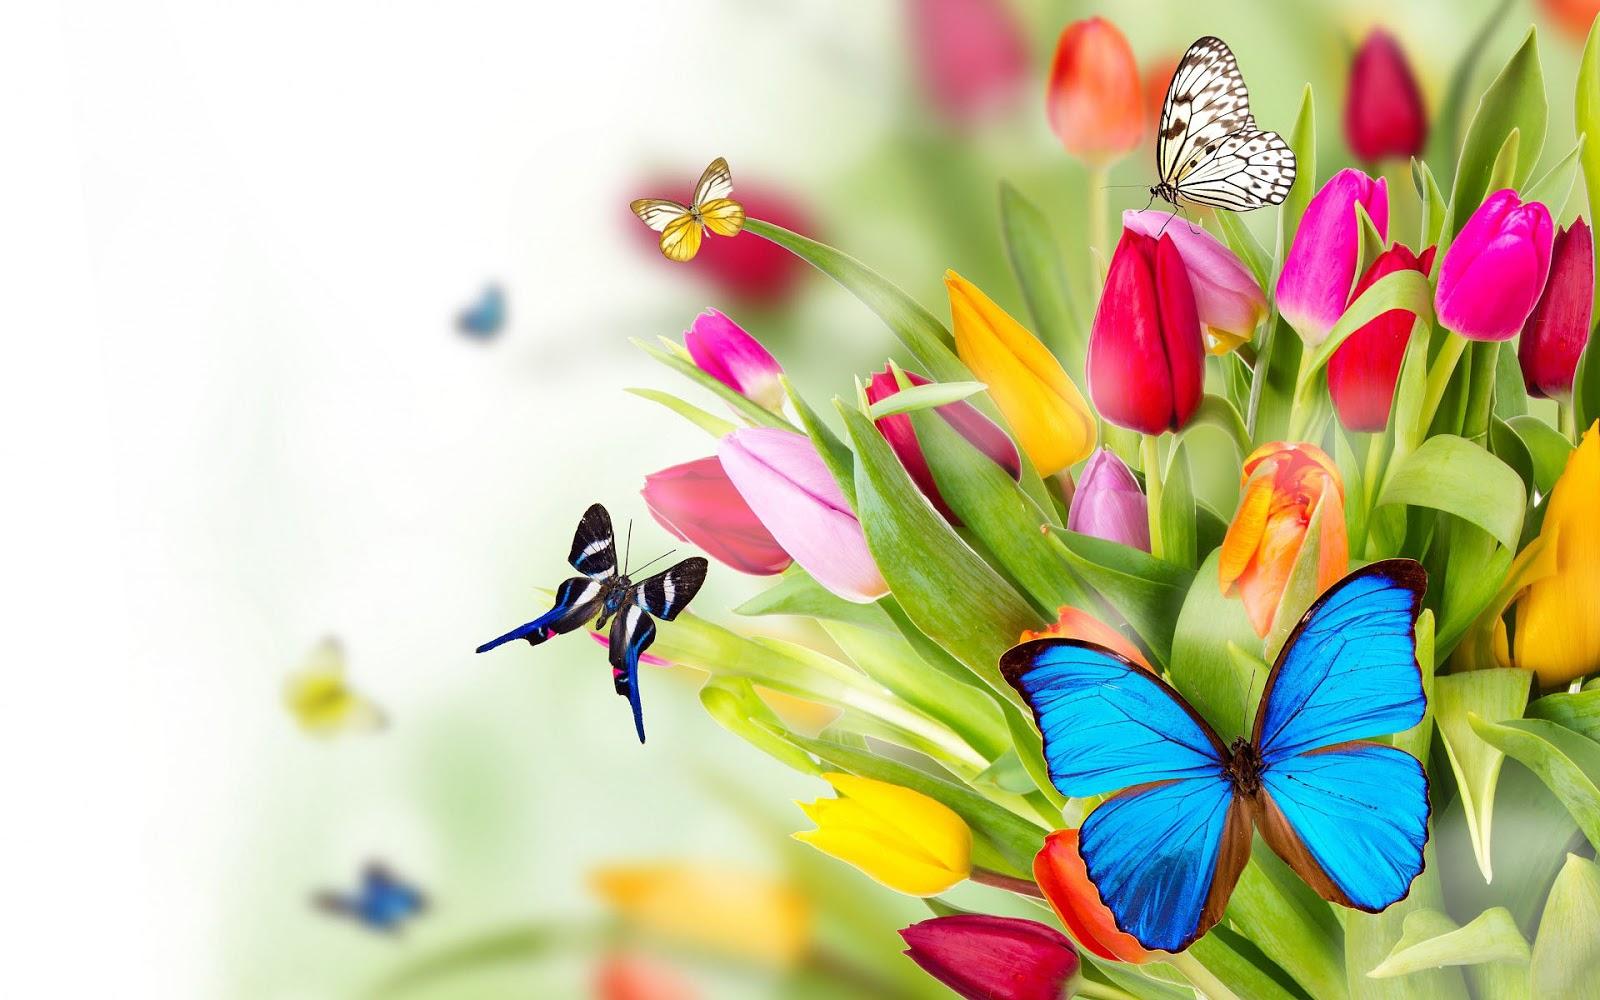 22 Lente Wallpapers Met Bloemen Mooie Leuke - Butterflies On The Flowers , HD Wallpaper & Backgrounds